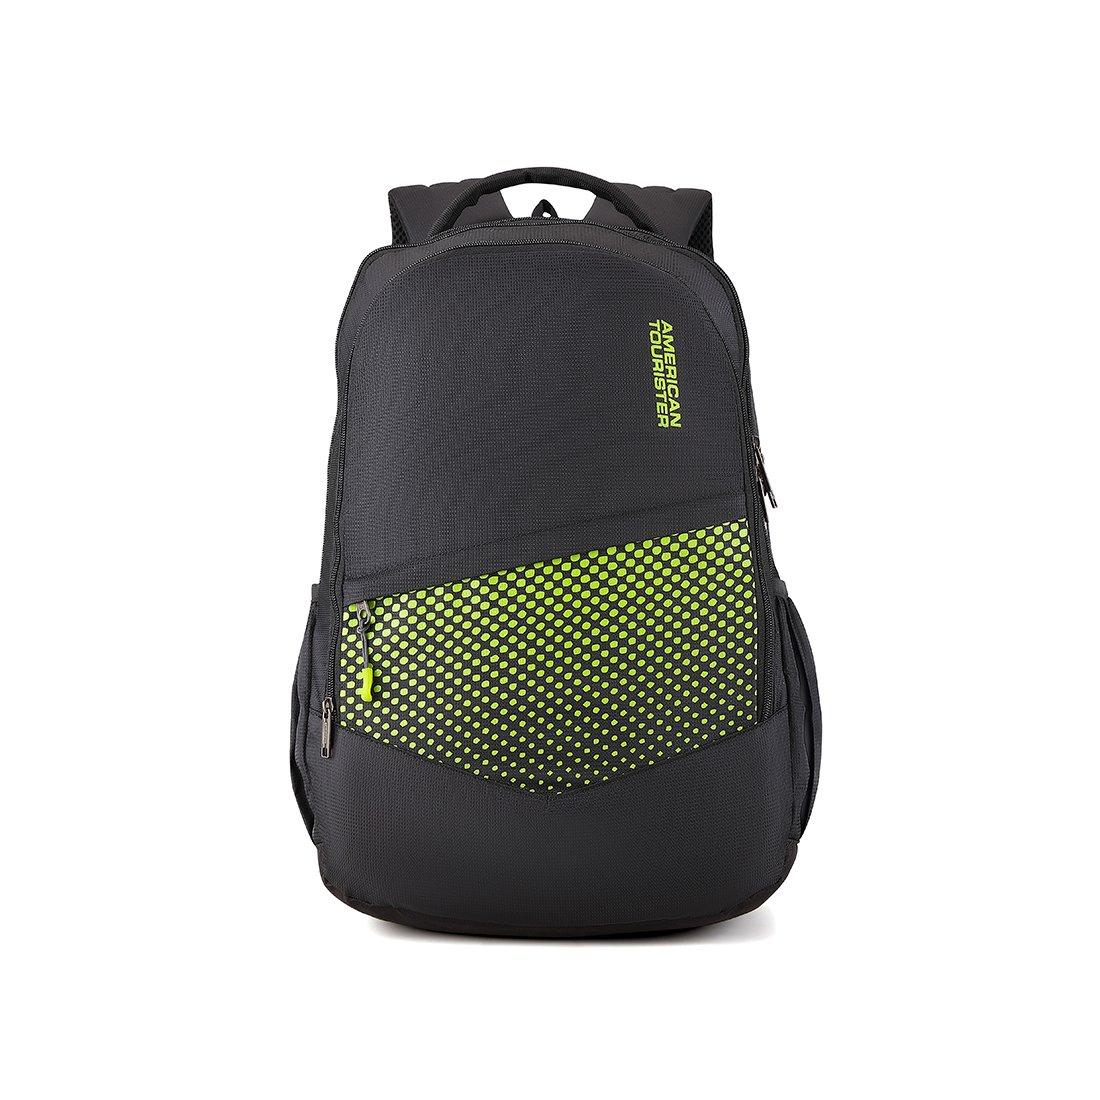 American Tourister 29.5 Ltrs Black Casual Backpack (AMT Mist SCH BAG02 Black)